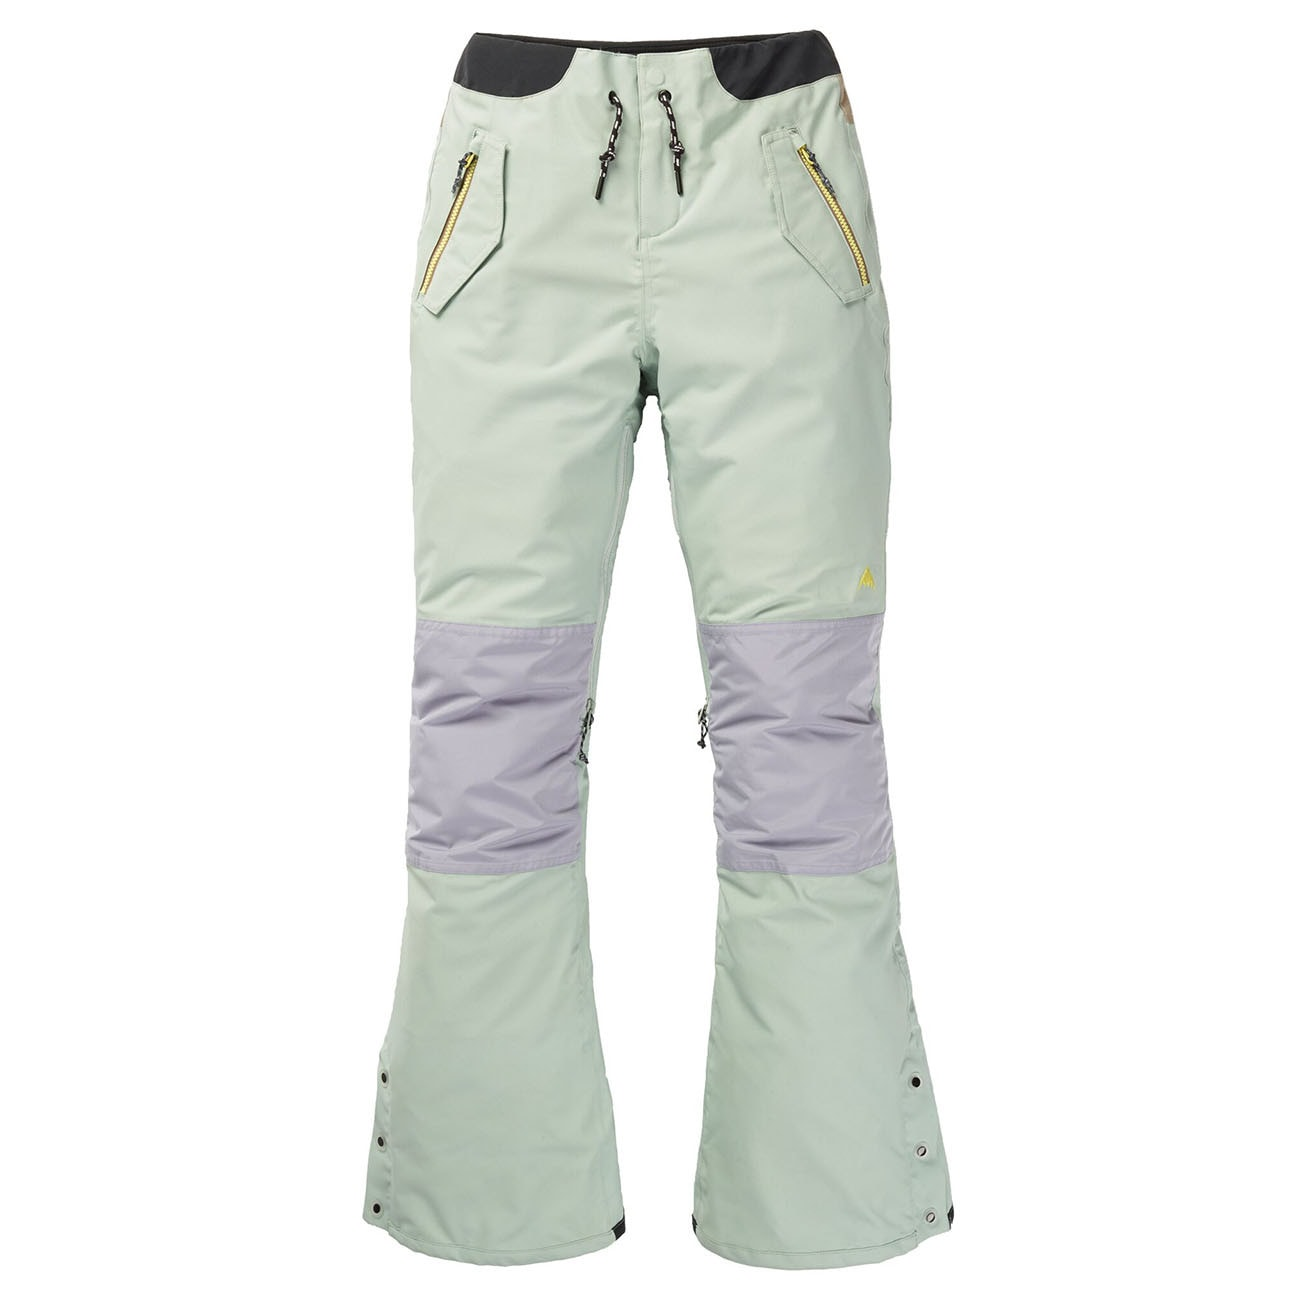 Burton Women Loyle Pants Aqua Gray Lilac Gray Timber Wolf 2020